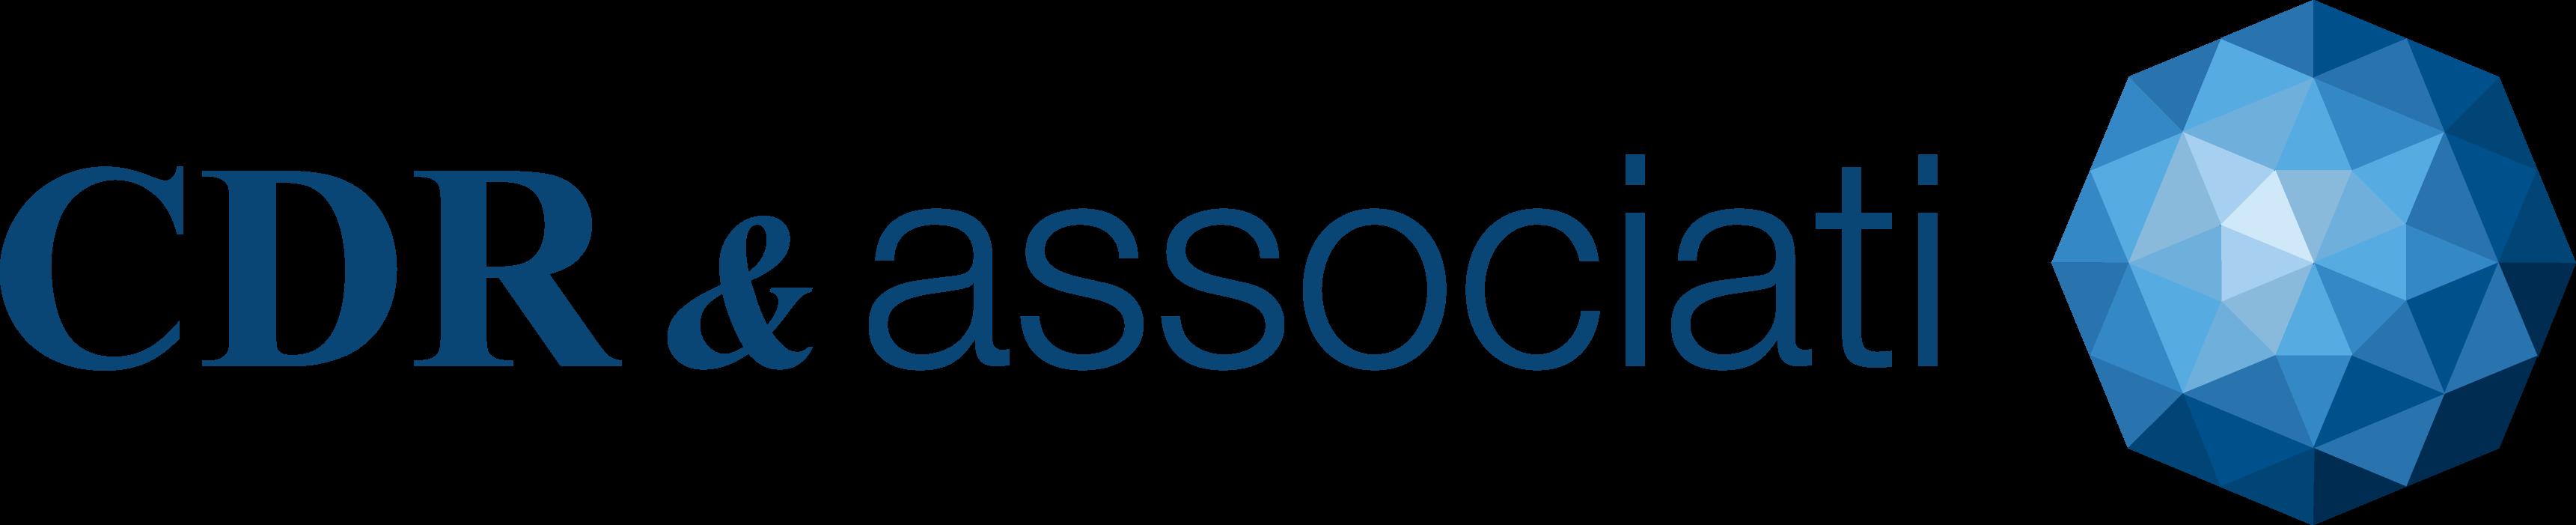 CDR Entreprise S.r.l. logo